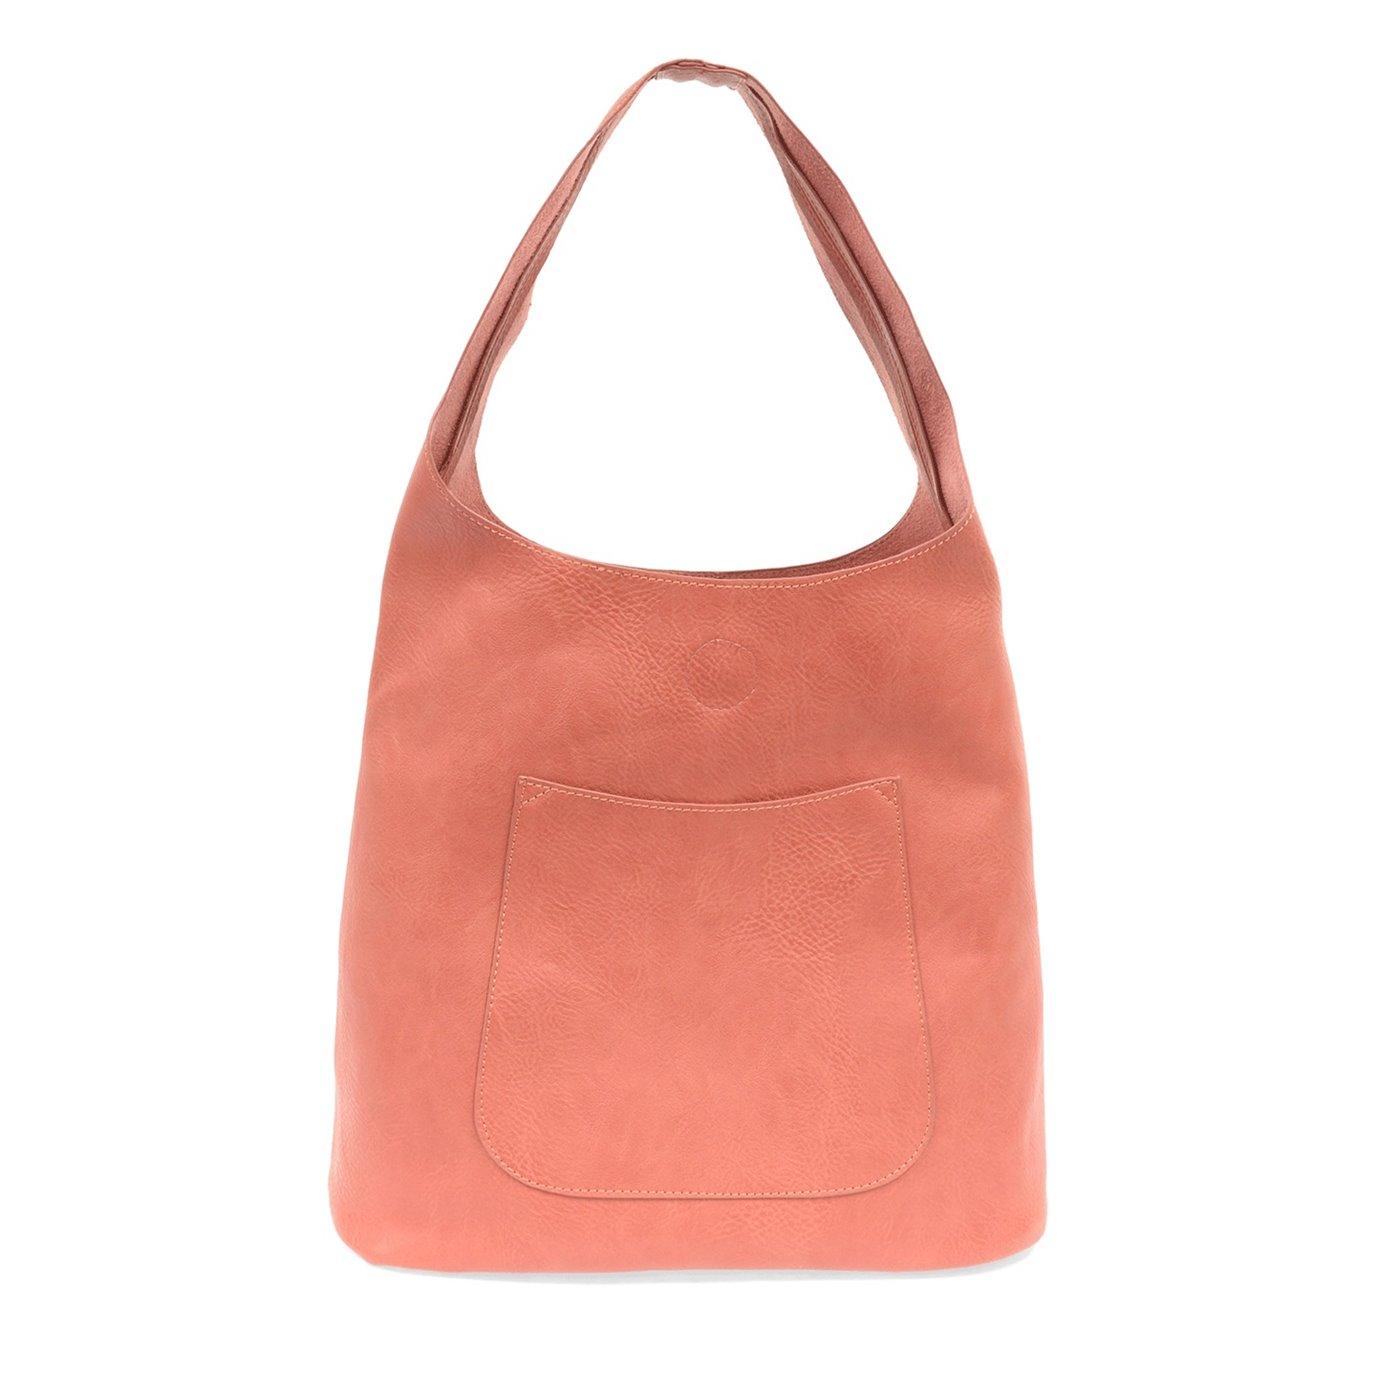 Coral Molly Slouchy Hobo Handbag